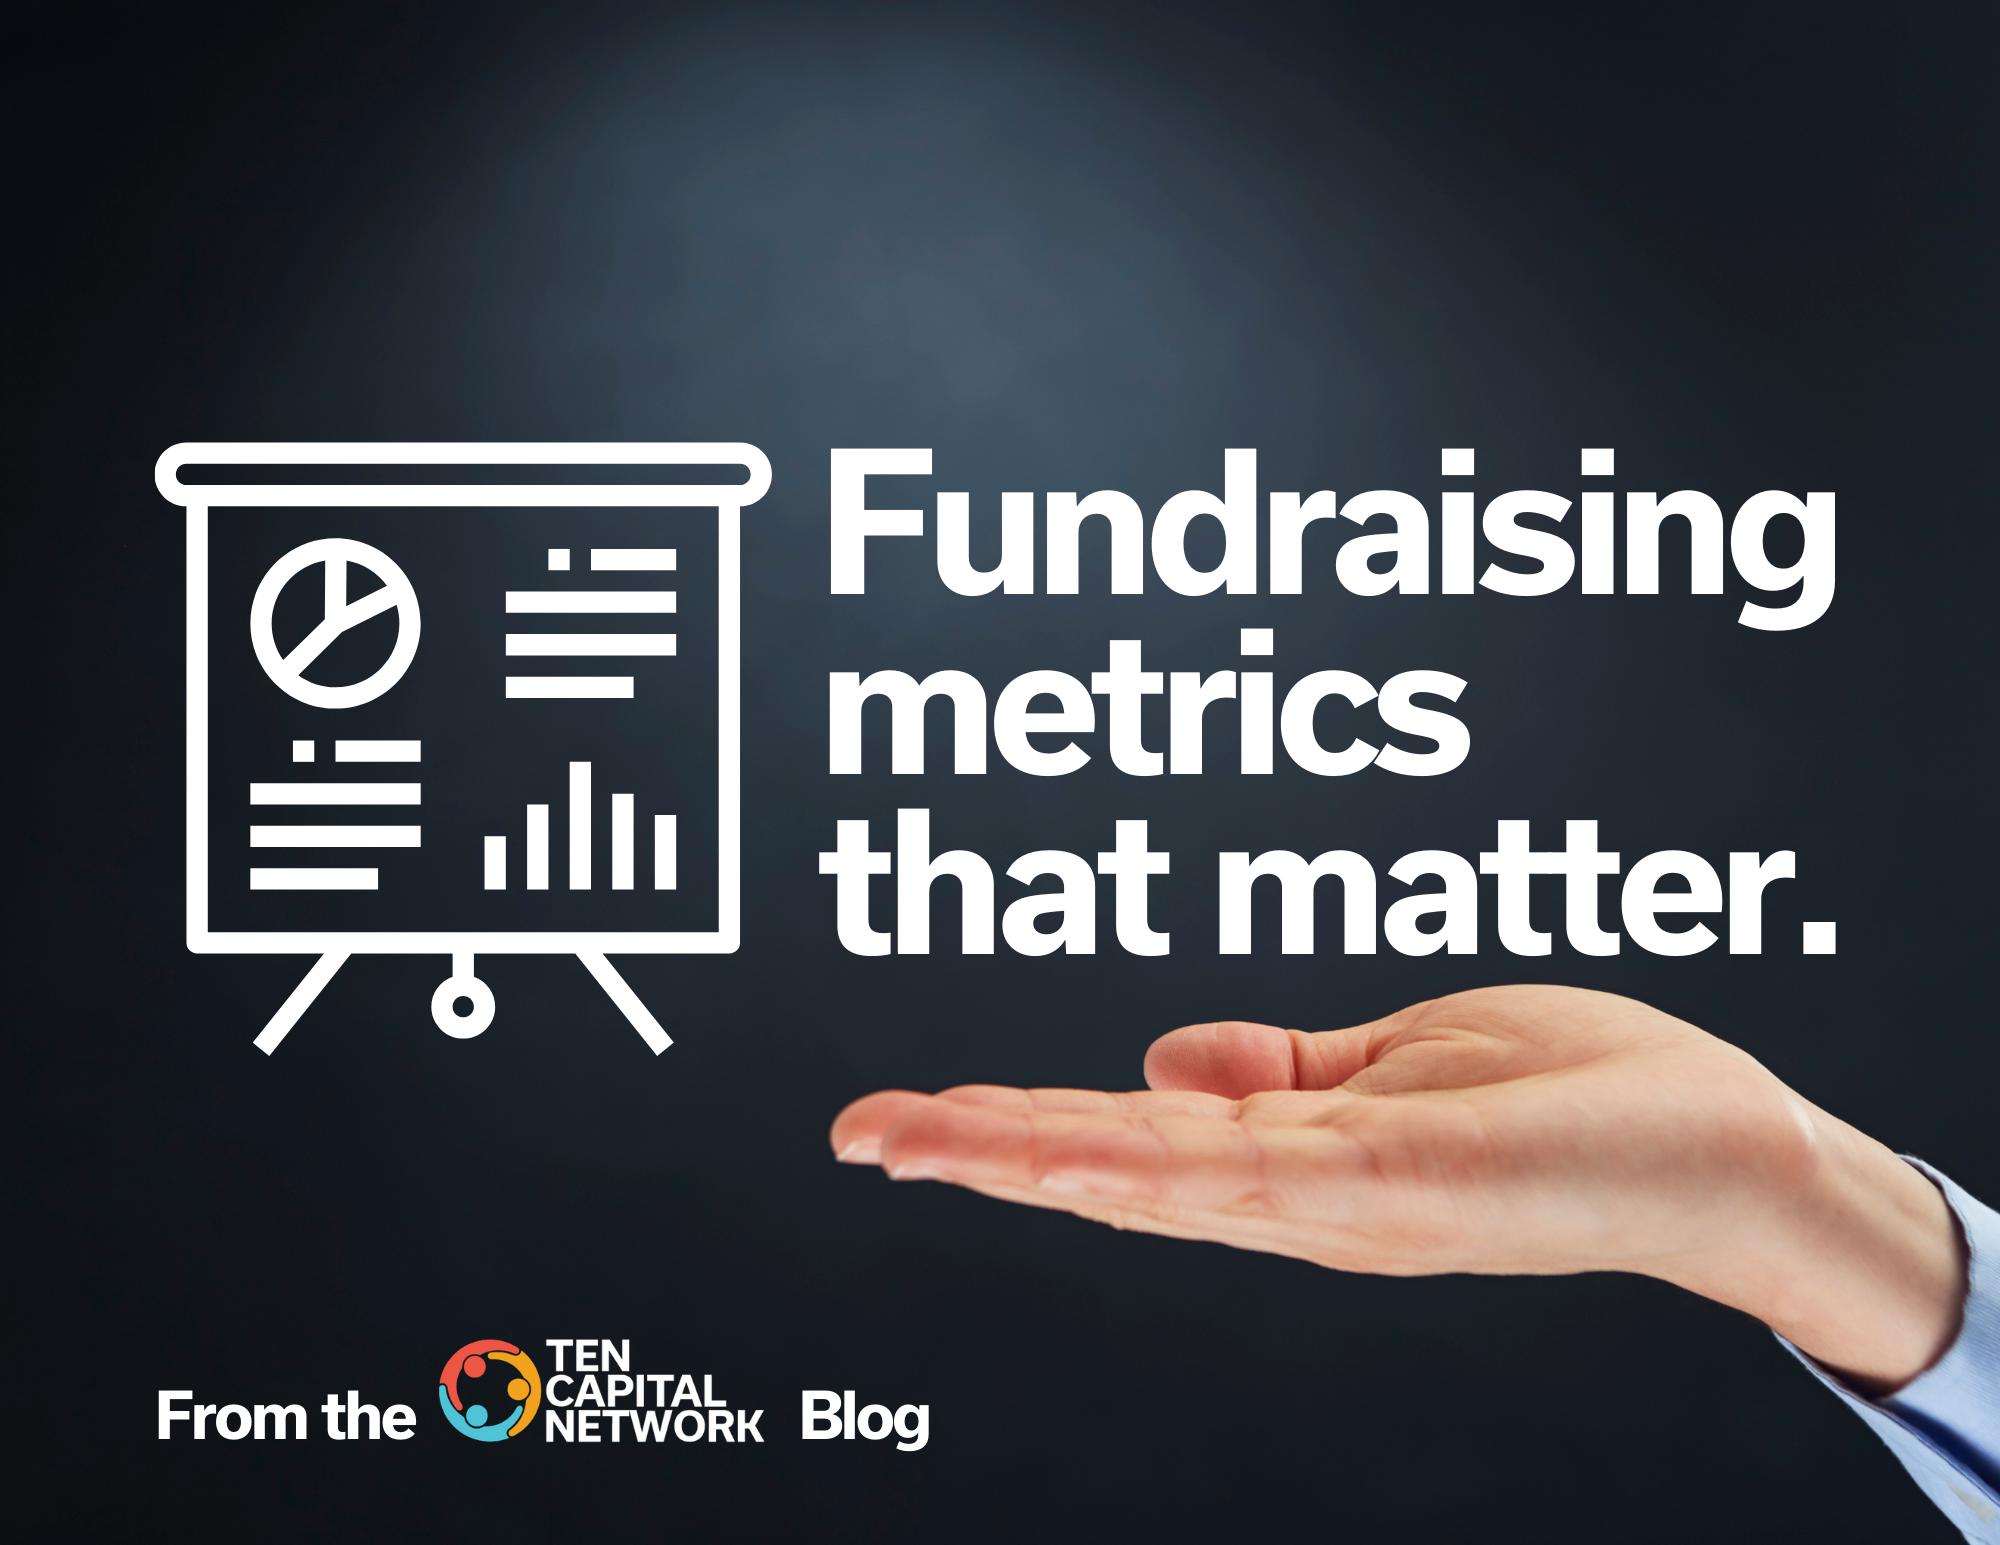 Fundraising metrics that matter